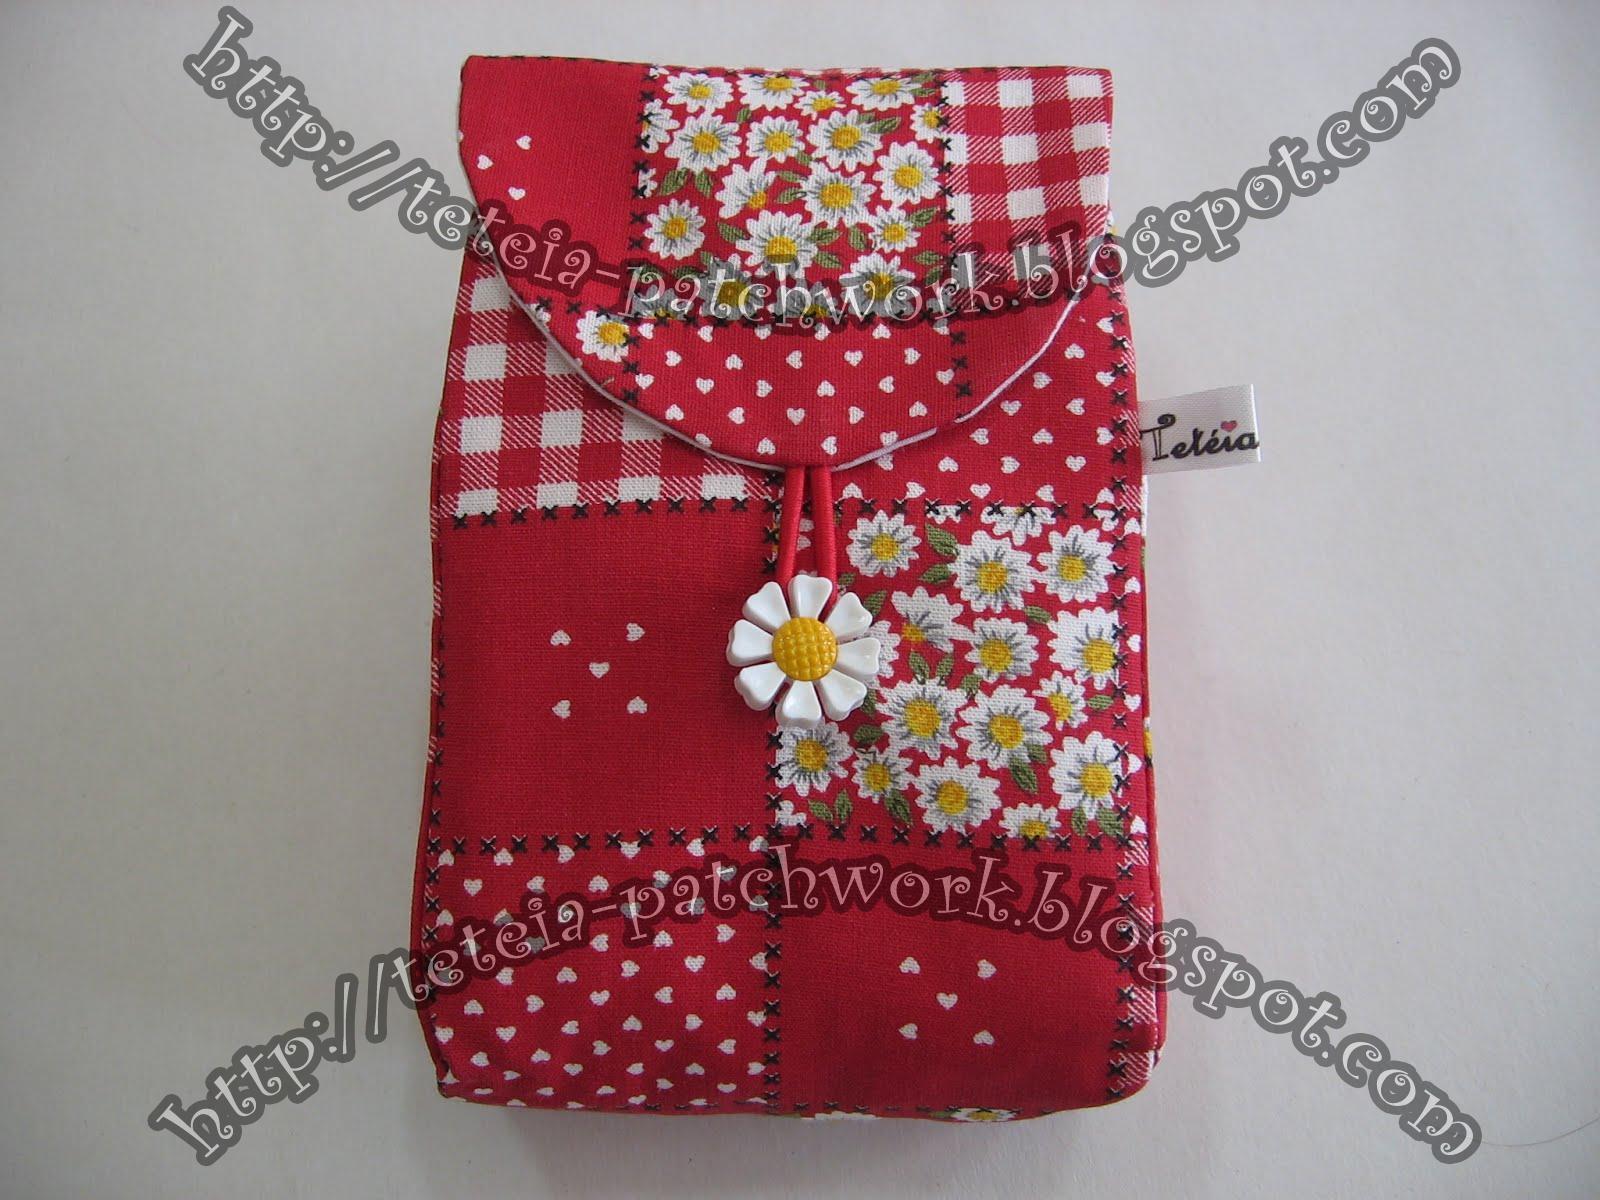 Tetéia Patchwork: Kit higiene bucal estampa patchwork/vermelho cod  #A82337 1600x1200